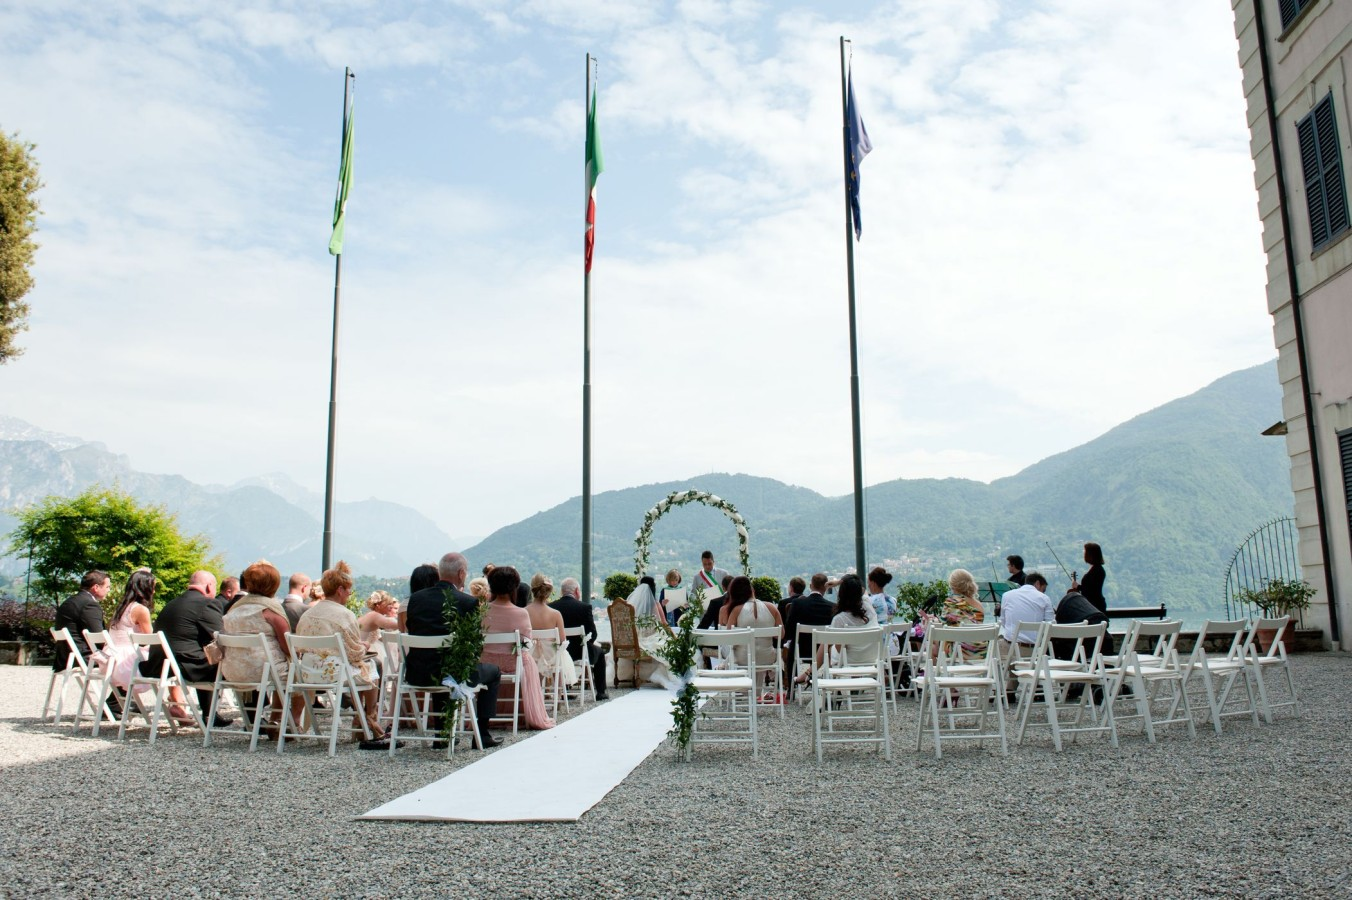 wedding-italy-outdoor-ceremony_03-1352×900